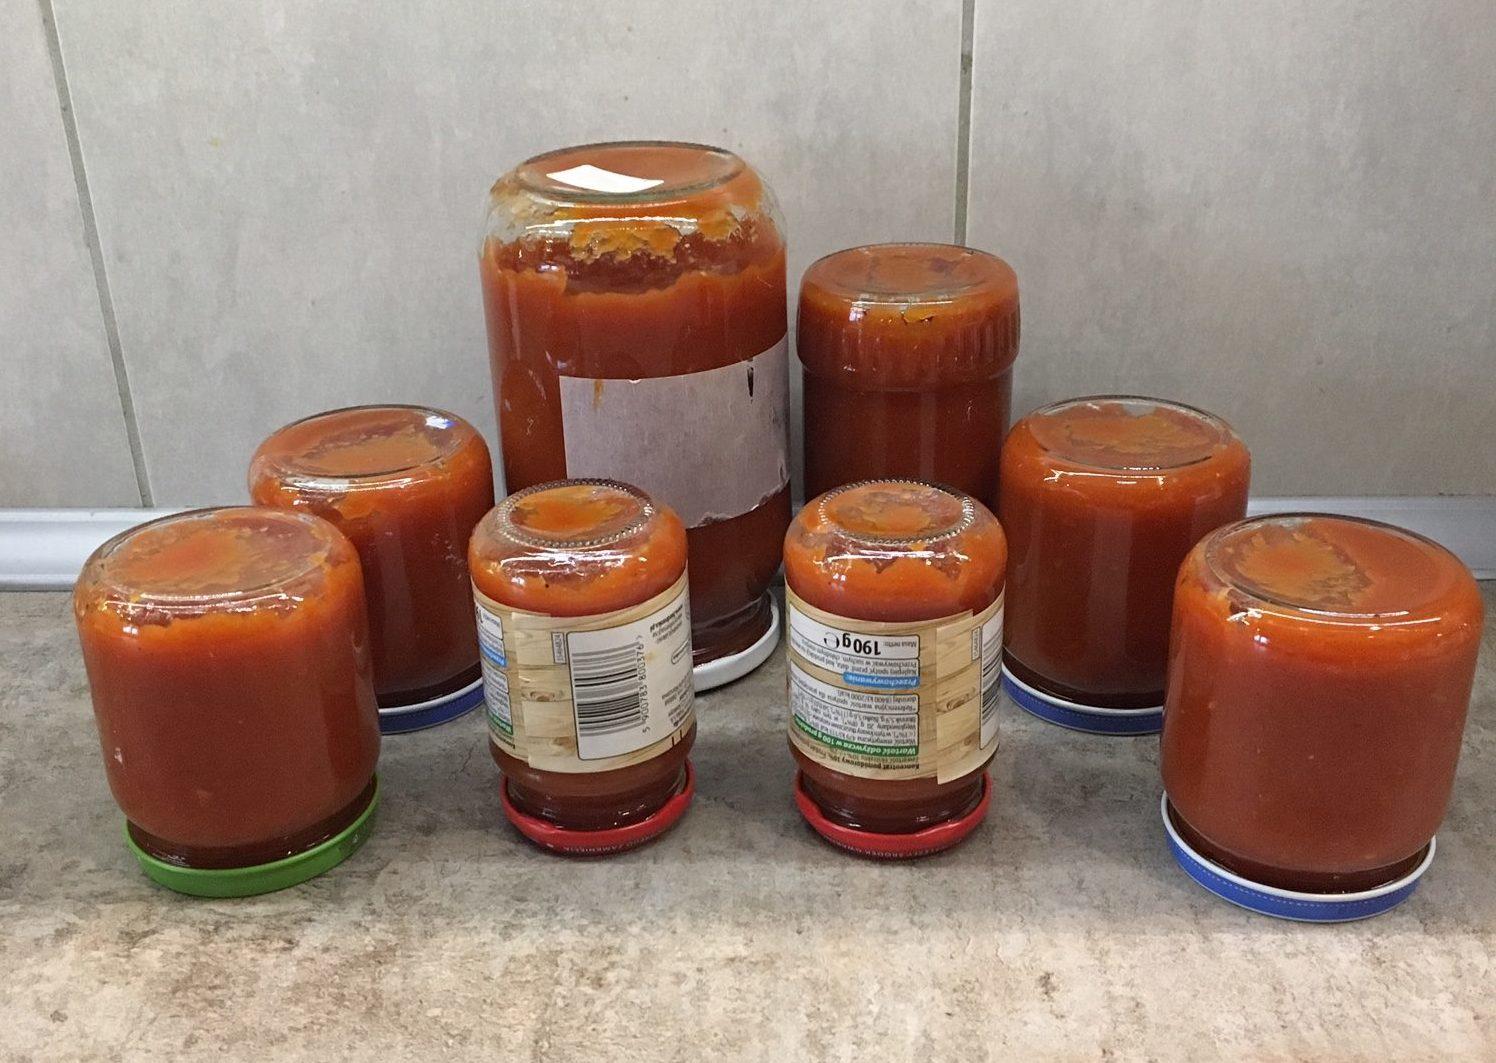 Ketchup domowy z cukinii, home made ketchup